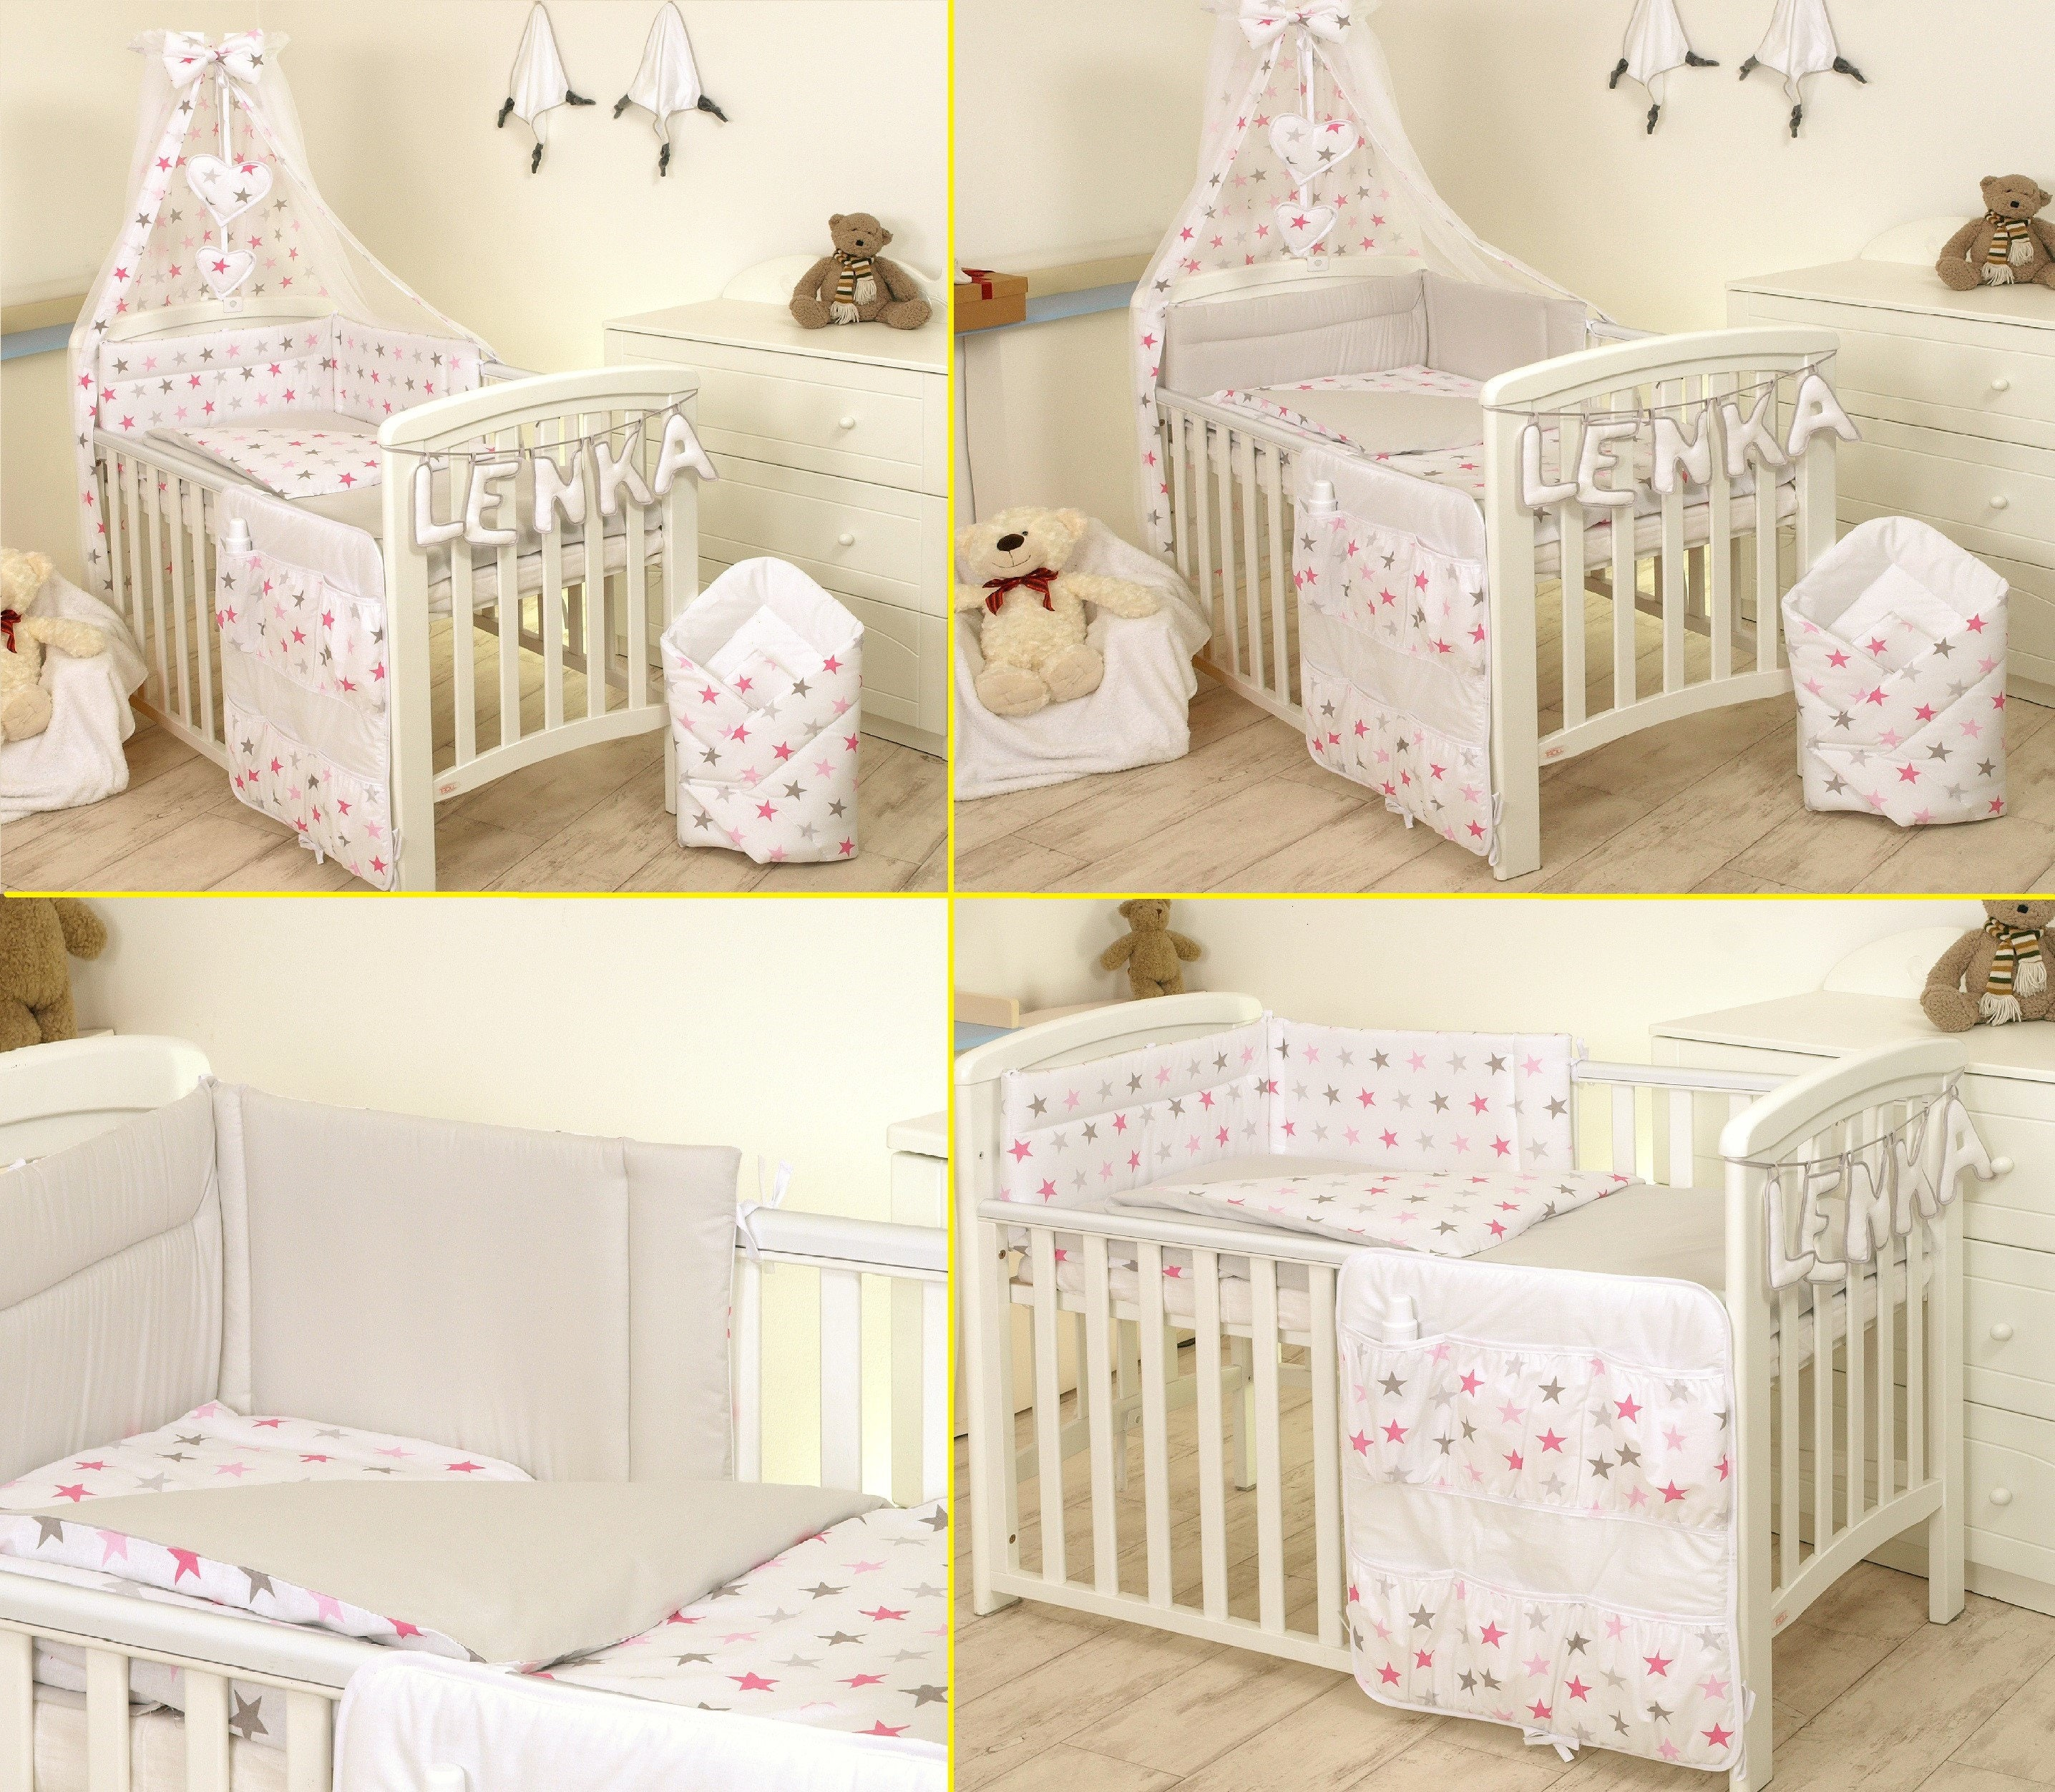 8 pc cot //cot bed bedding sets PILLOW BUMPER CASES pink stars grey duvet cover